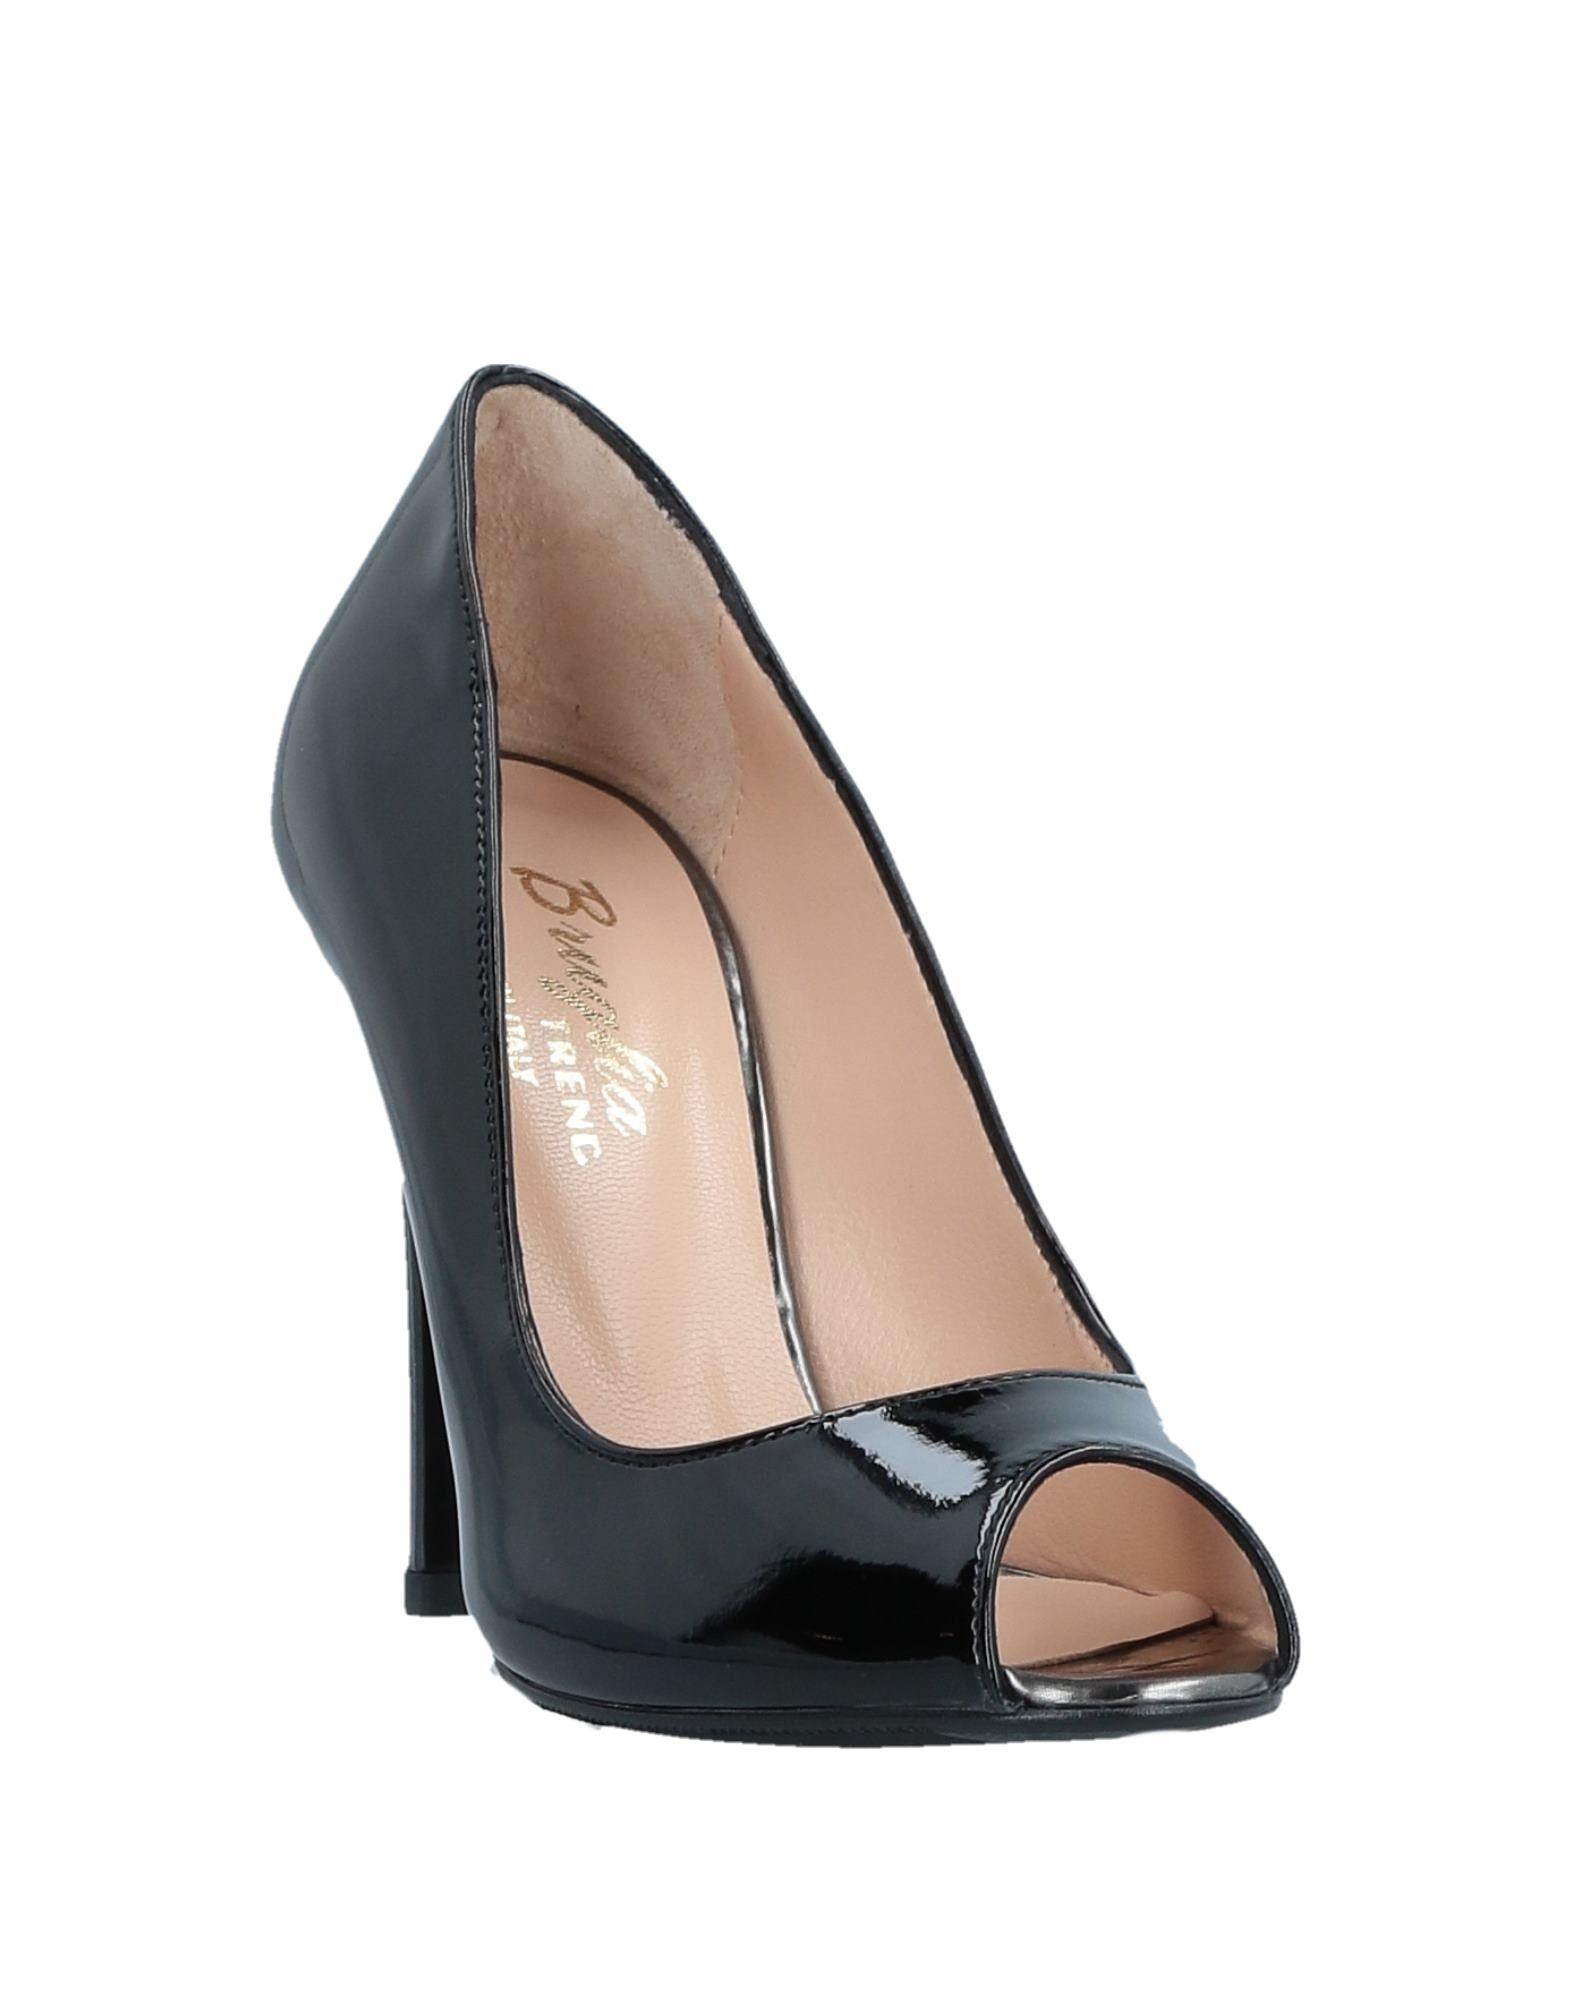 Stilvolle Pumps billige Schuhe F.Lli Bruglia Pumps Stilvolle Damen  11519986VJ 2841bf